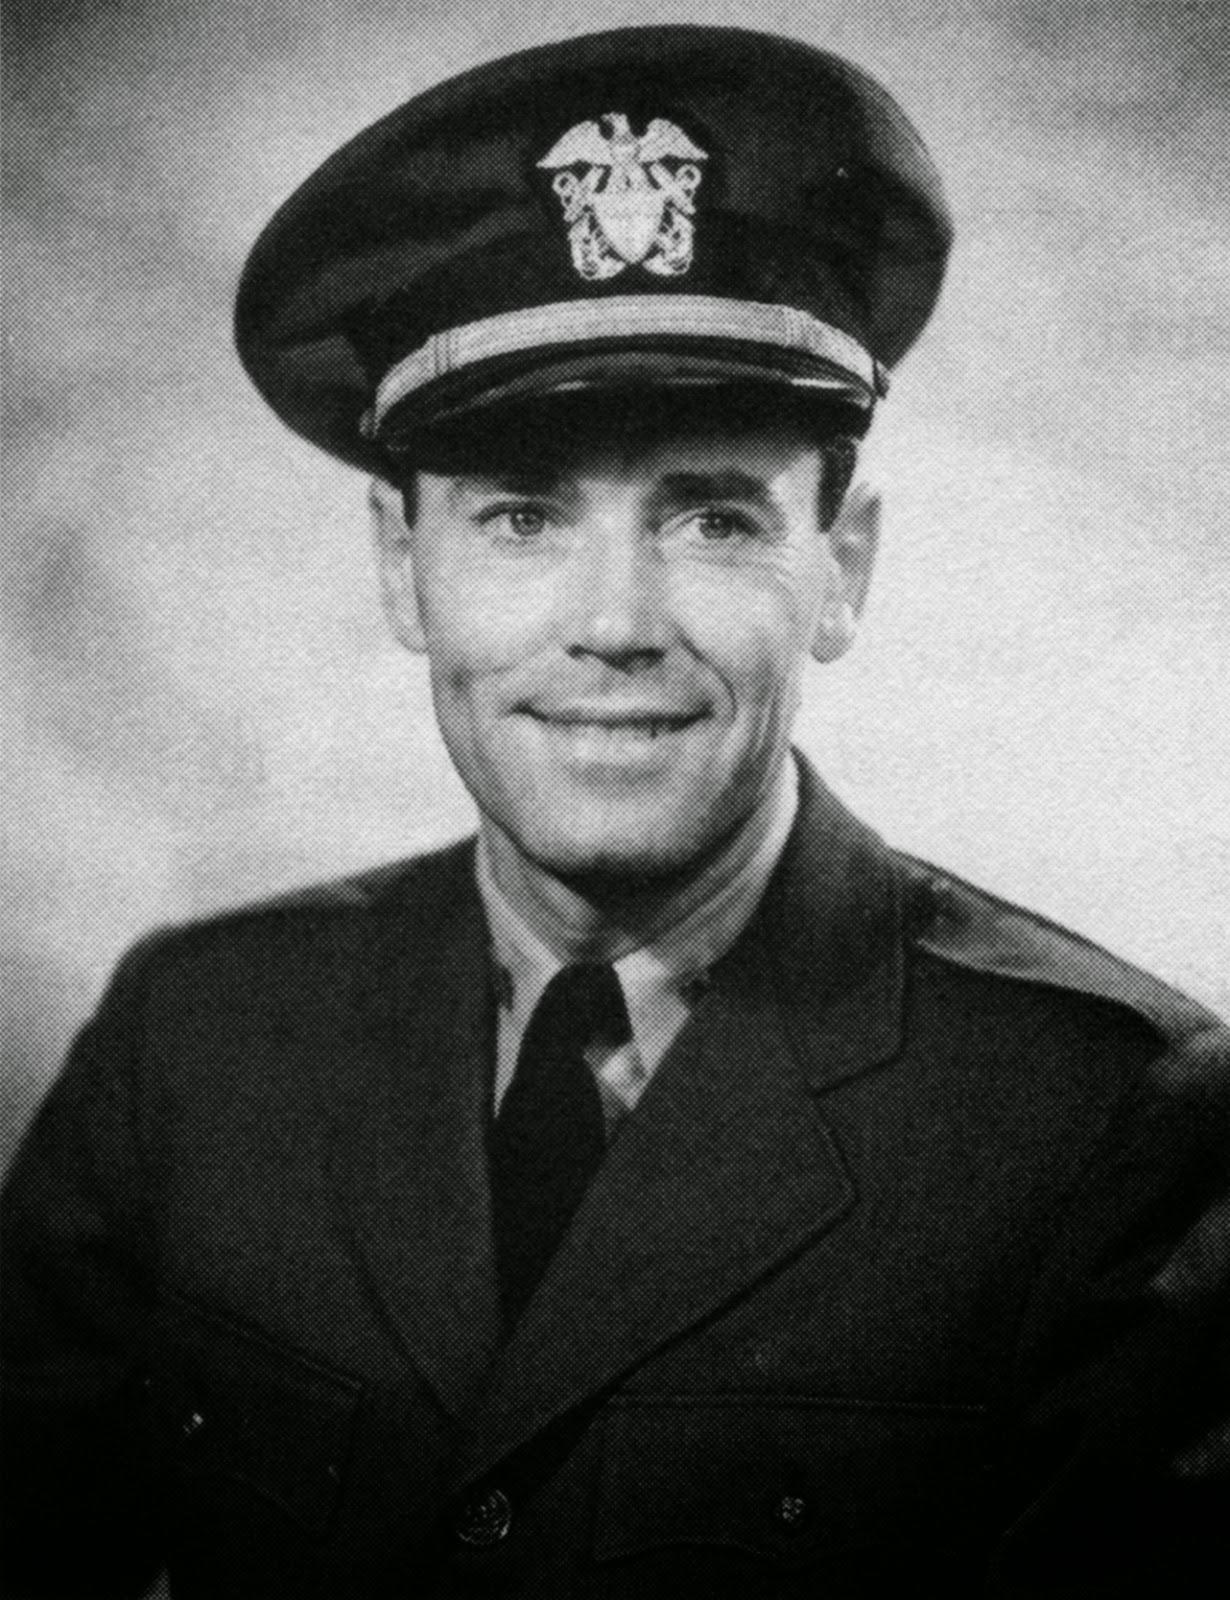 http://upload.wikimedia.org/wikipedia/commons/6/65/Henry_Fonda_-_USN.jpg